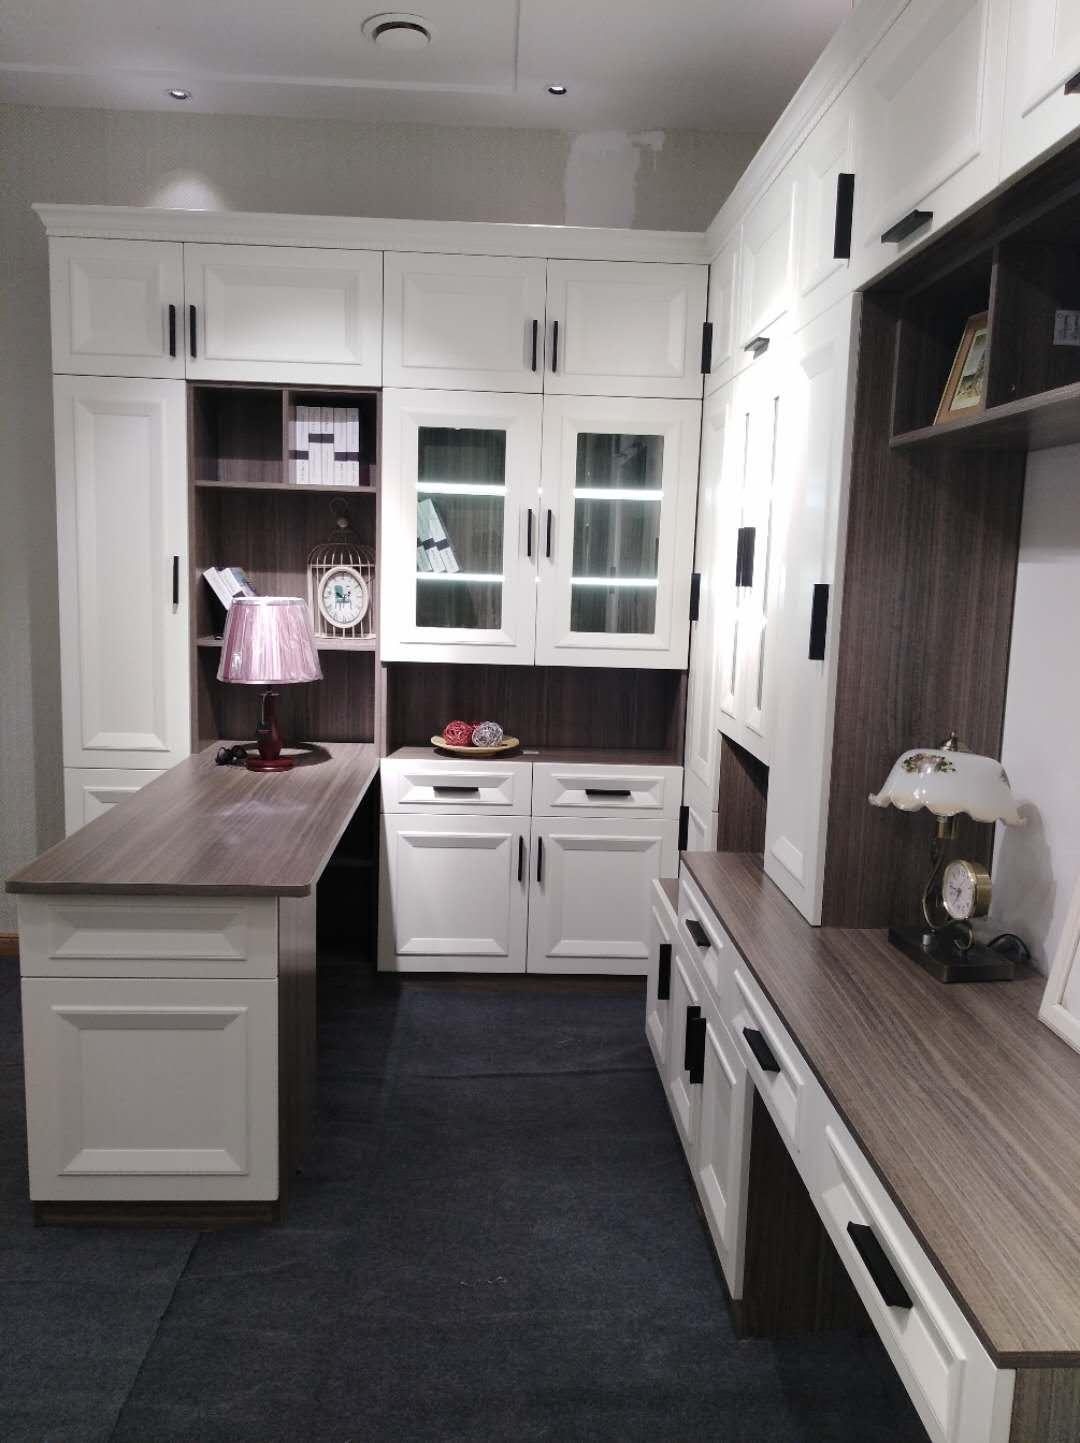 lehu vip板式家具的市场发展如何?